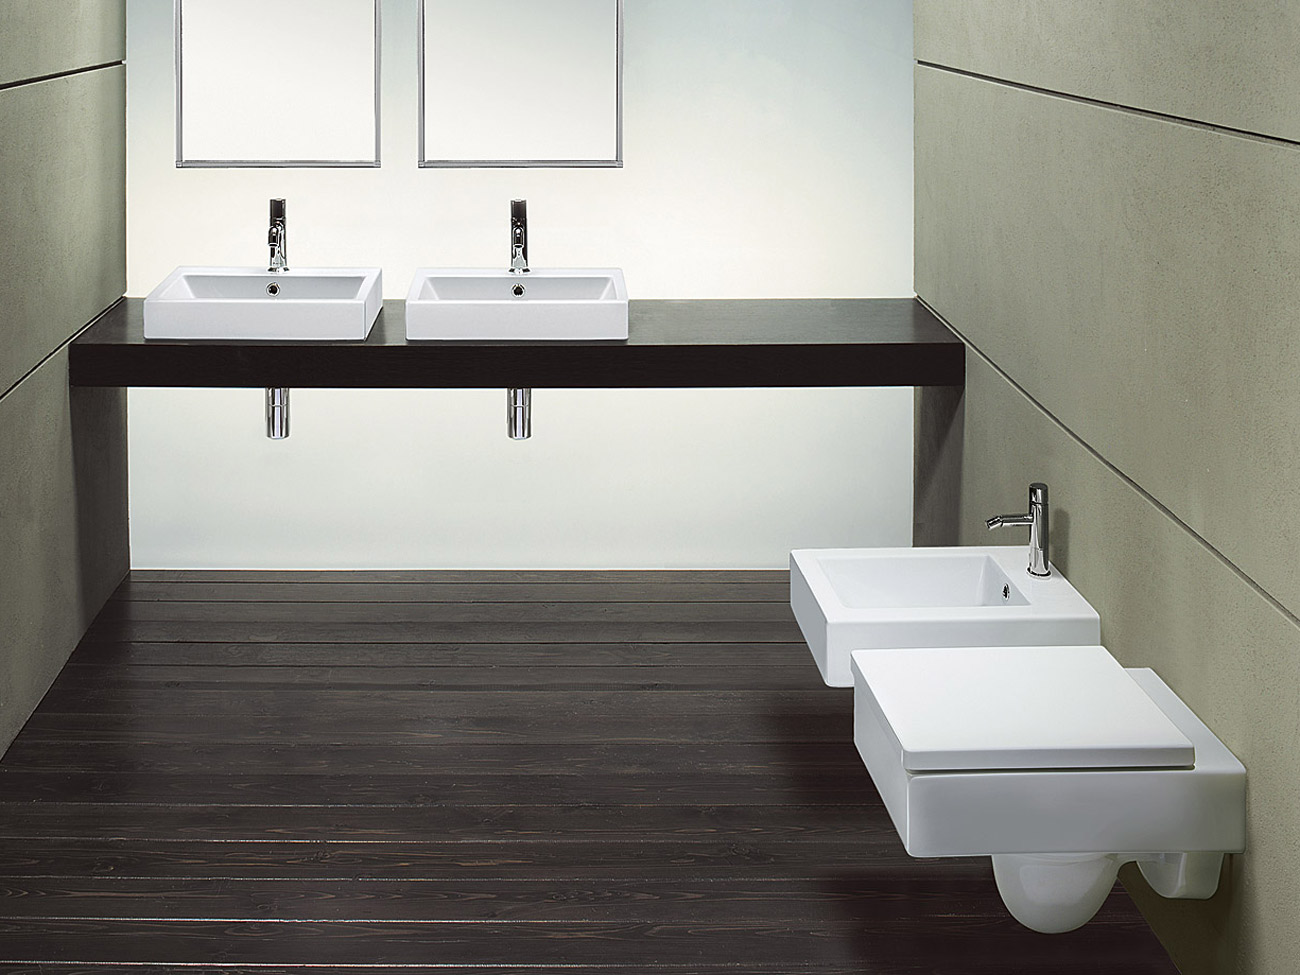 Zero 50 lavabo rectangular by ceramica catalano dise o cdc - Lavabos dobles sobre encimera ...